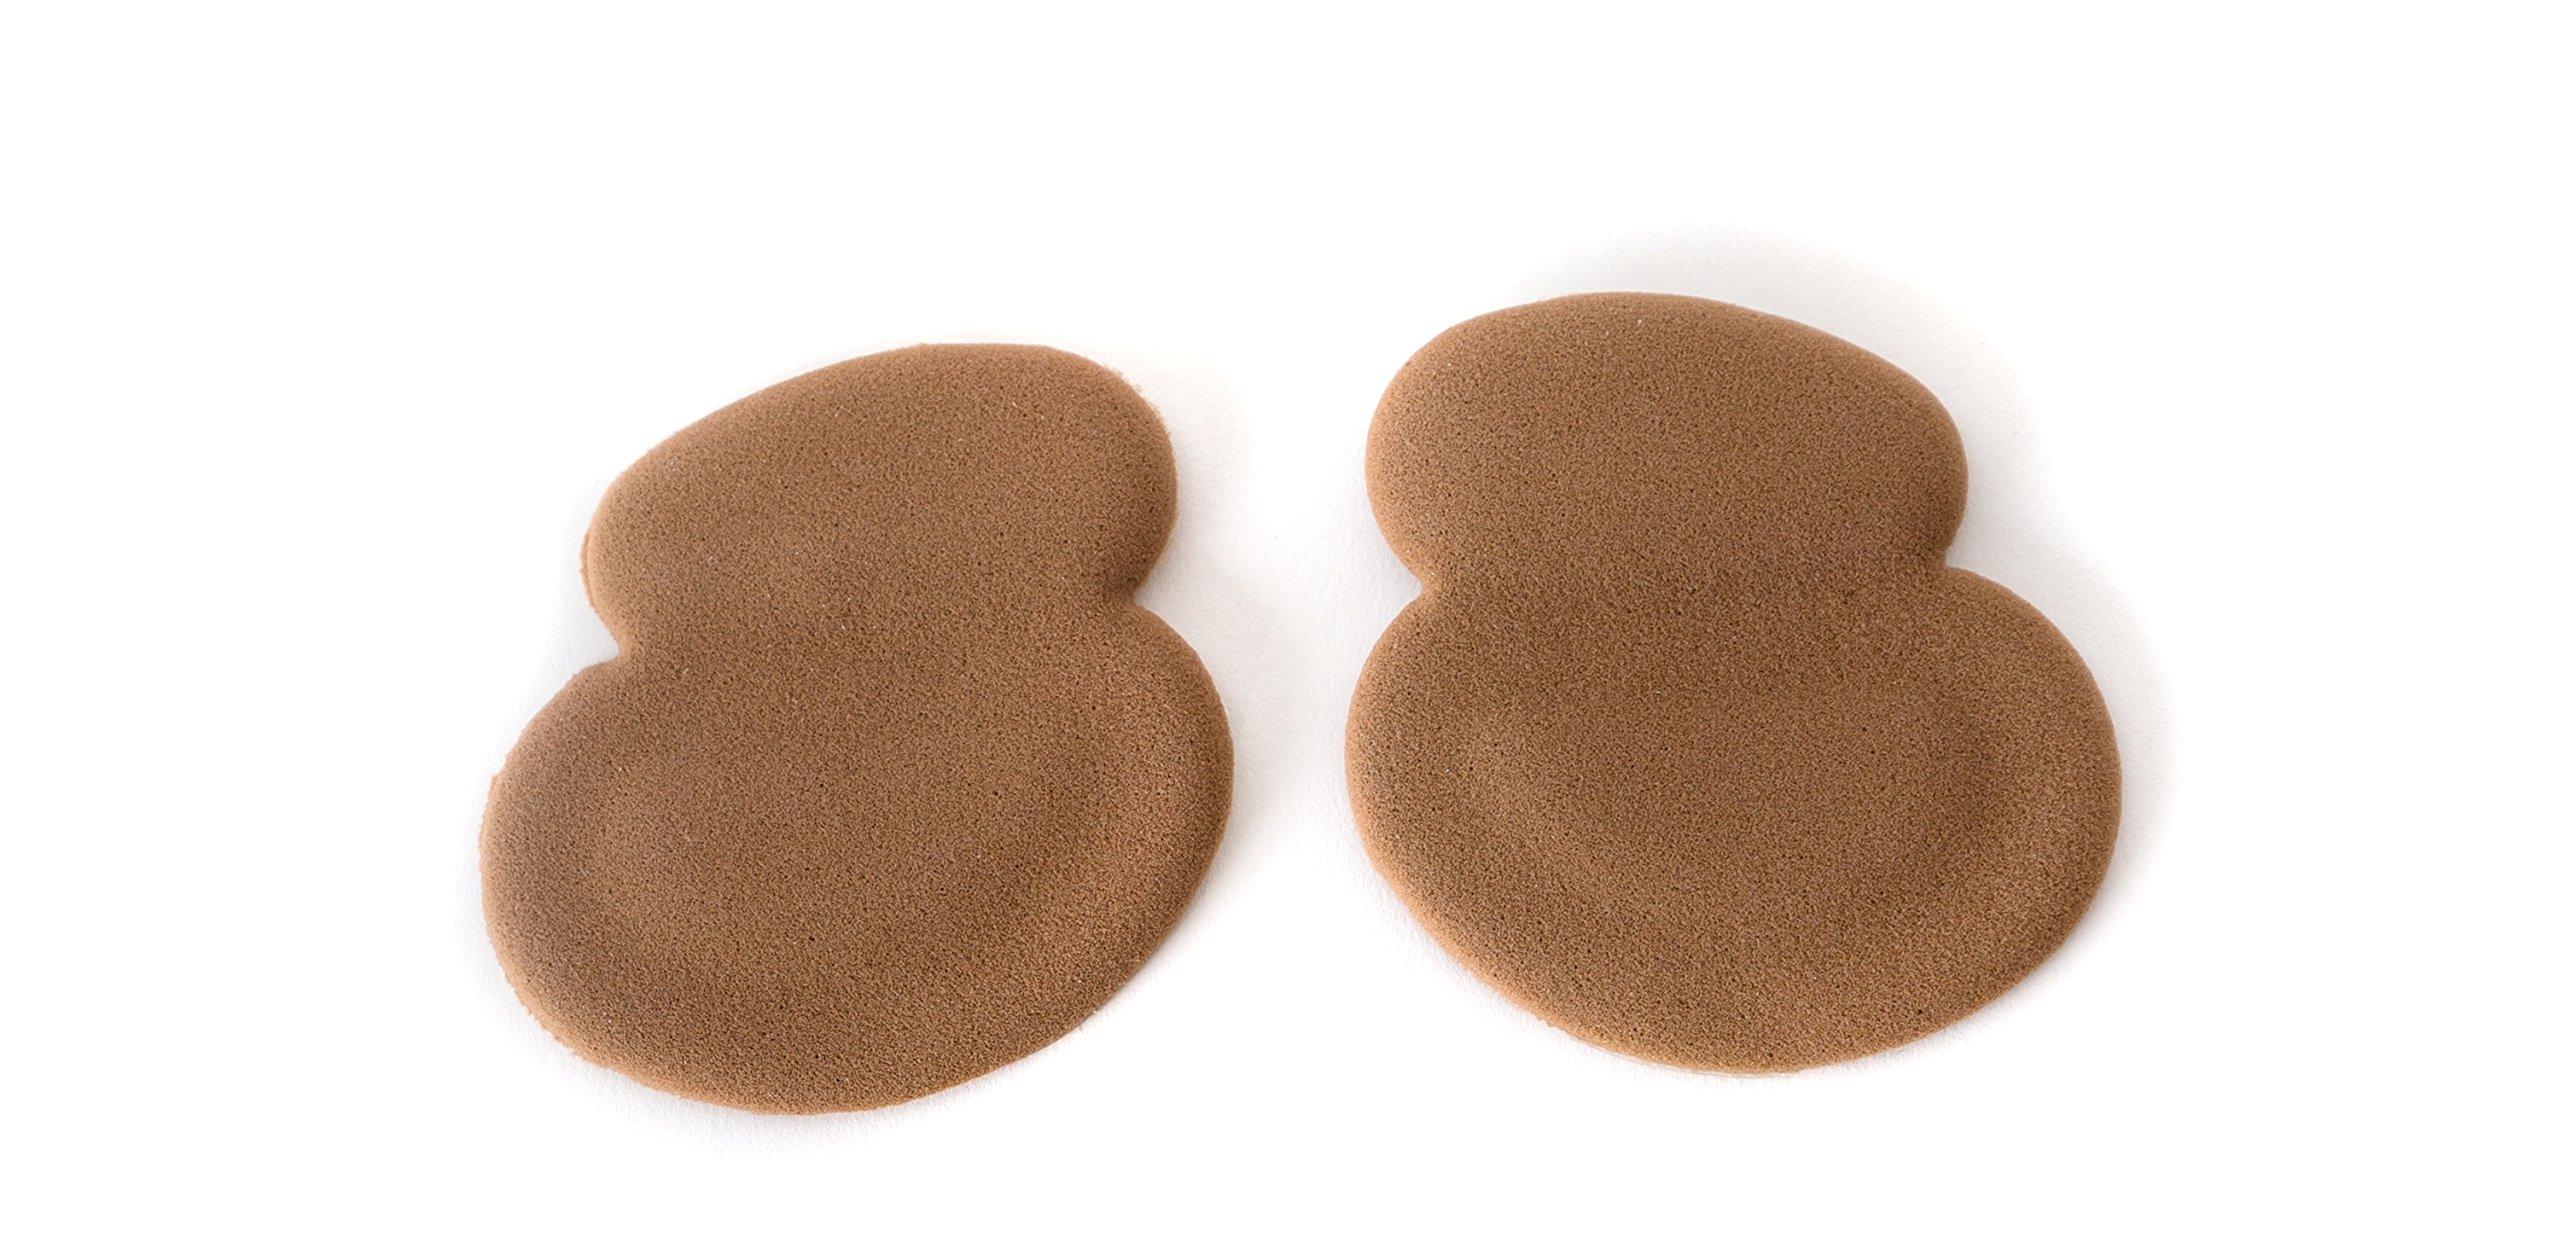 Ball of Foot Cushion Rebounding PORON Foam Toe Grip Stops Slide Stabilizes Foot Ergonomic fit